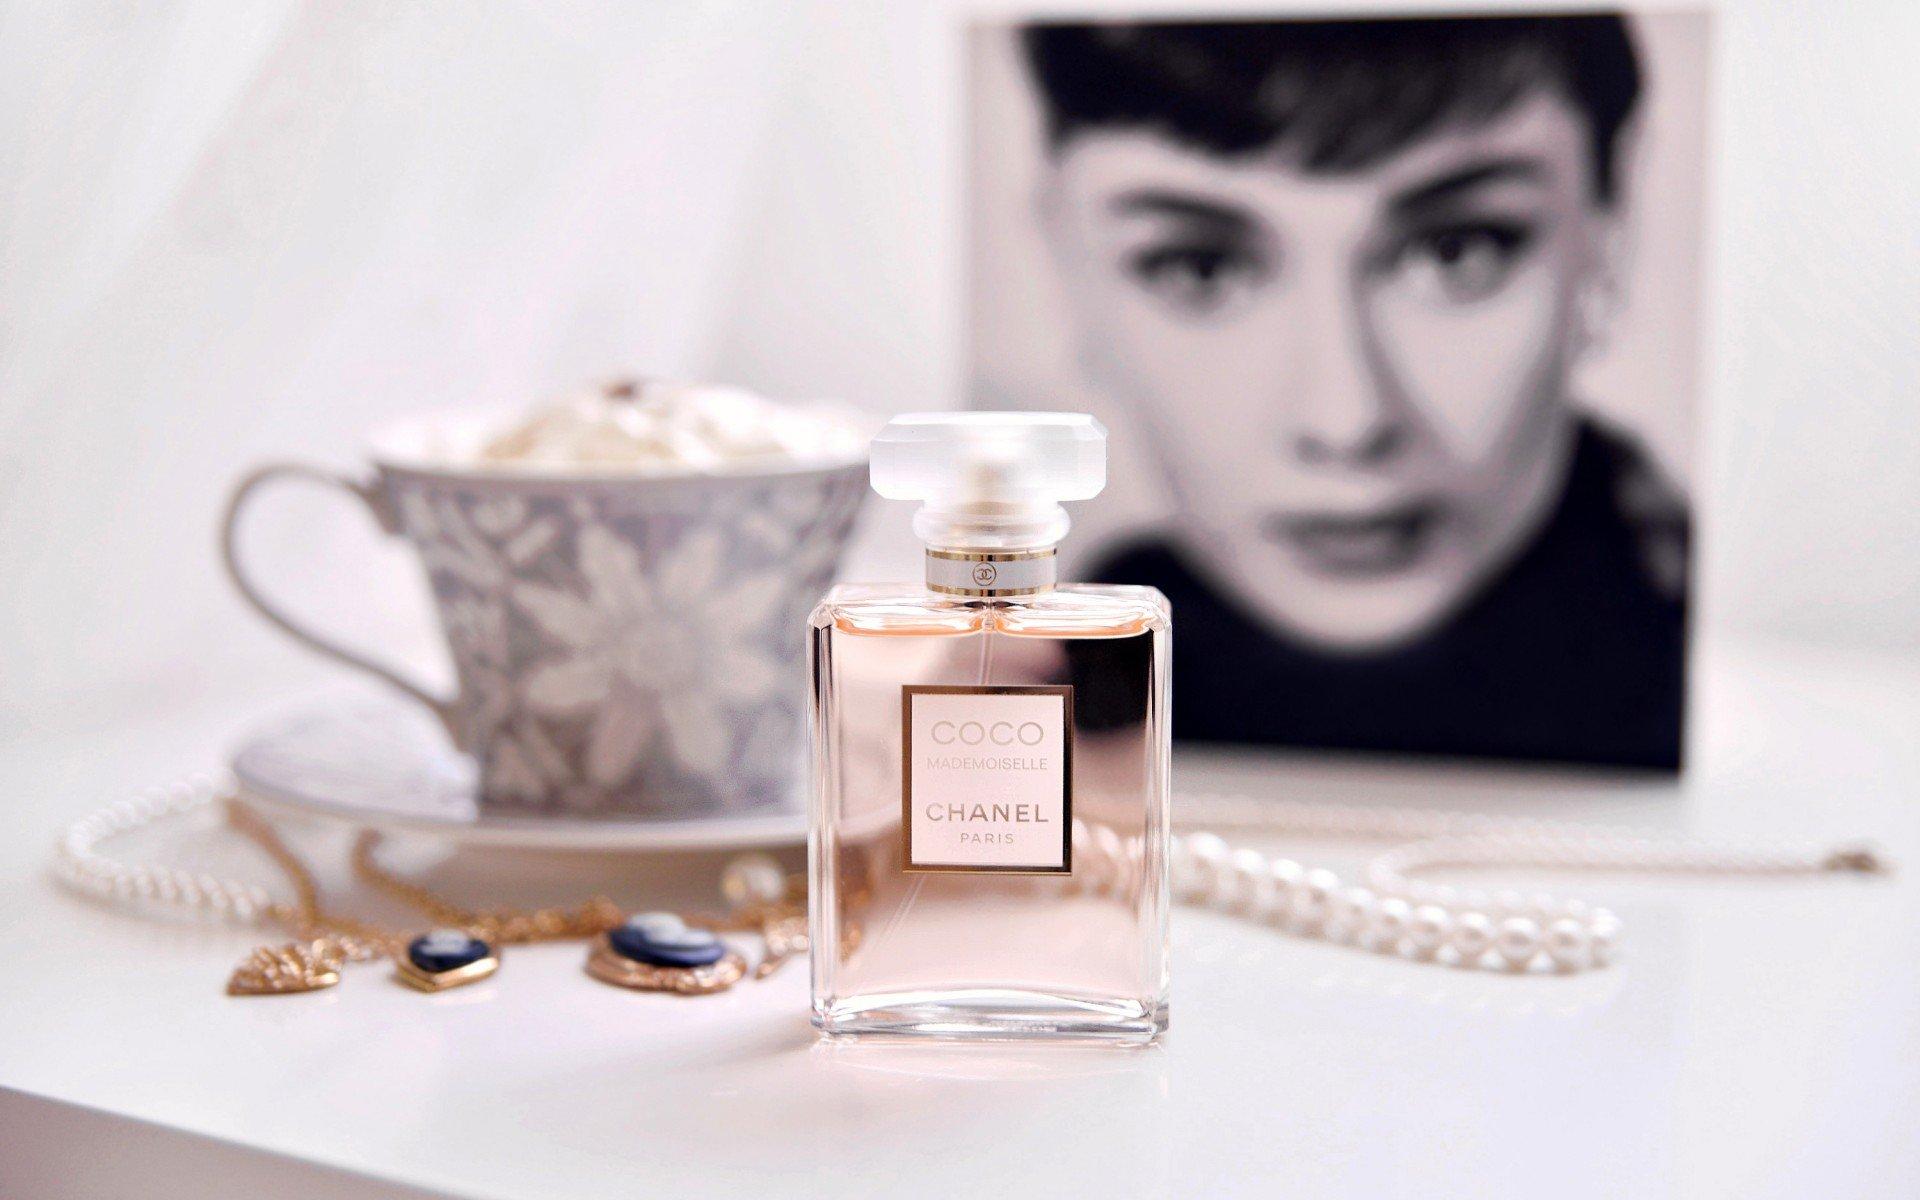 Nước hoa Chanel Coco Mademoiselle thanh lịch 4